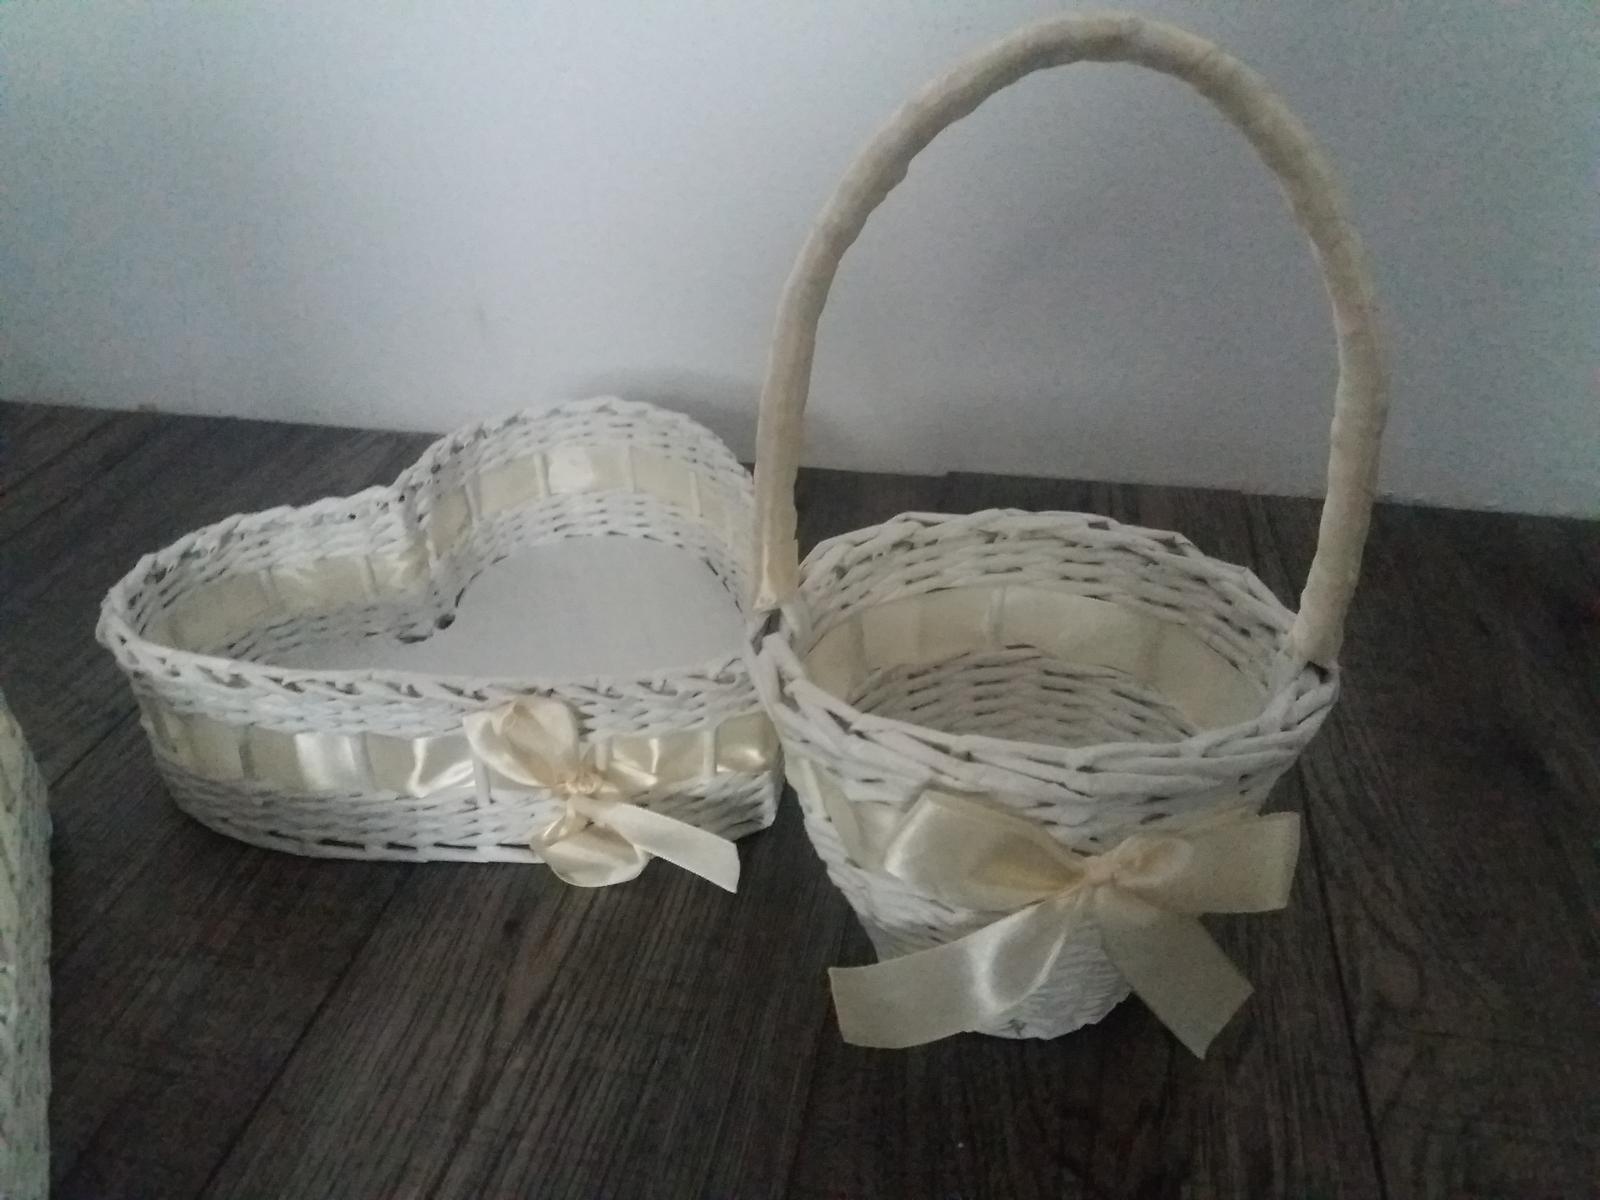 svadobné košíky na pierka/zákusky/lupene - Obrázok č. 3